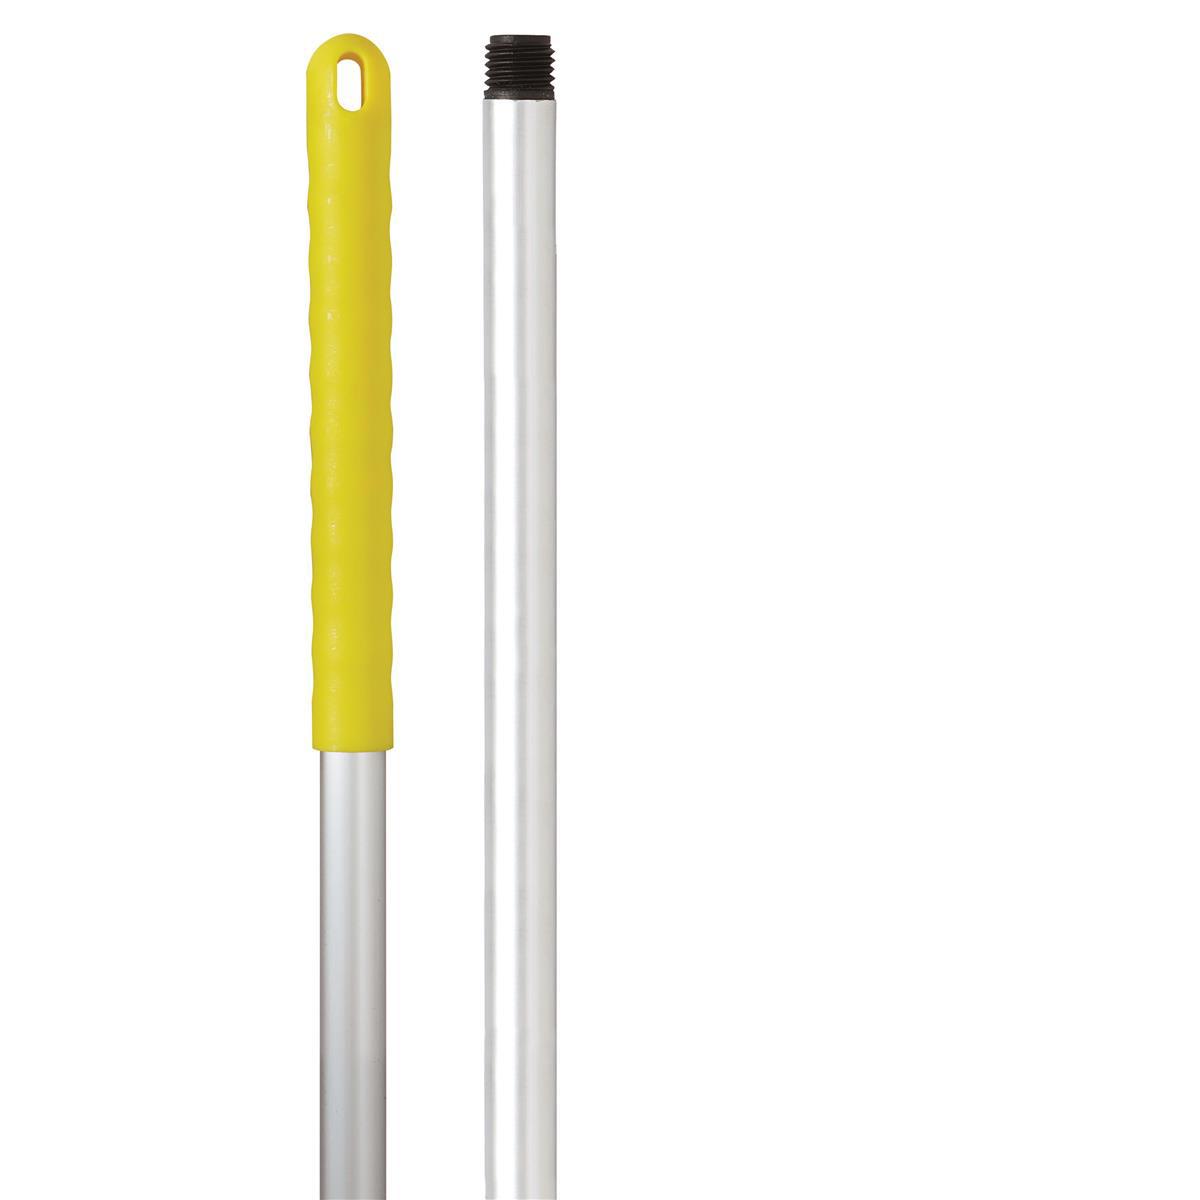 Robert Scott & Sons Abbey Hygiene Mop Handle Aluminium Colour-coded Screw 125cm Yellow Ref 103132YELLOW